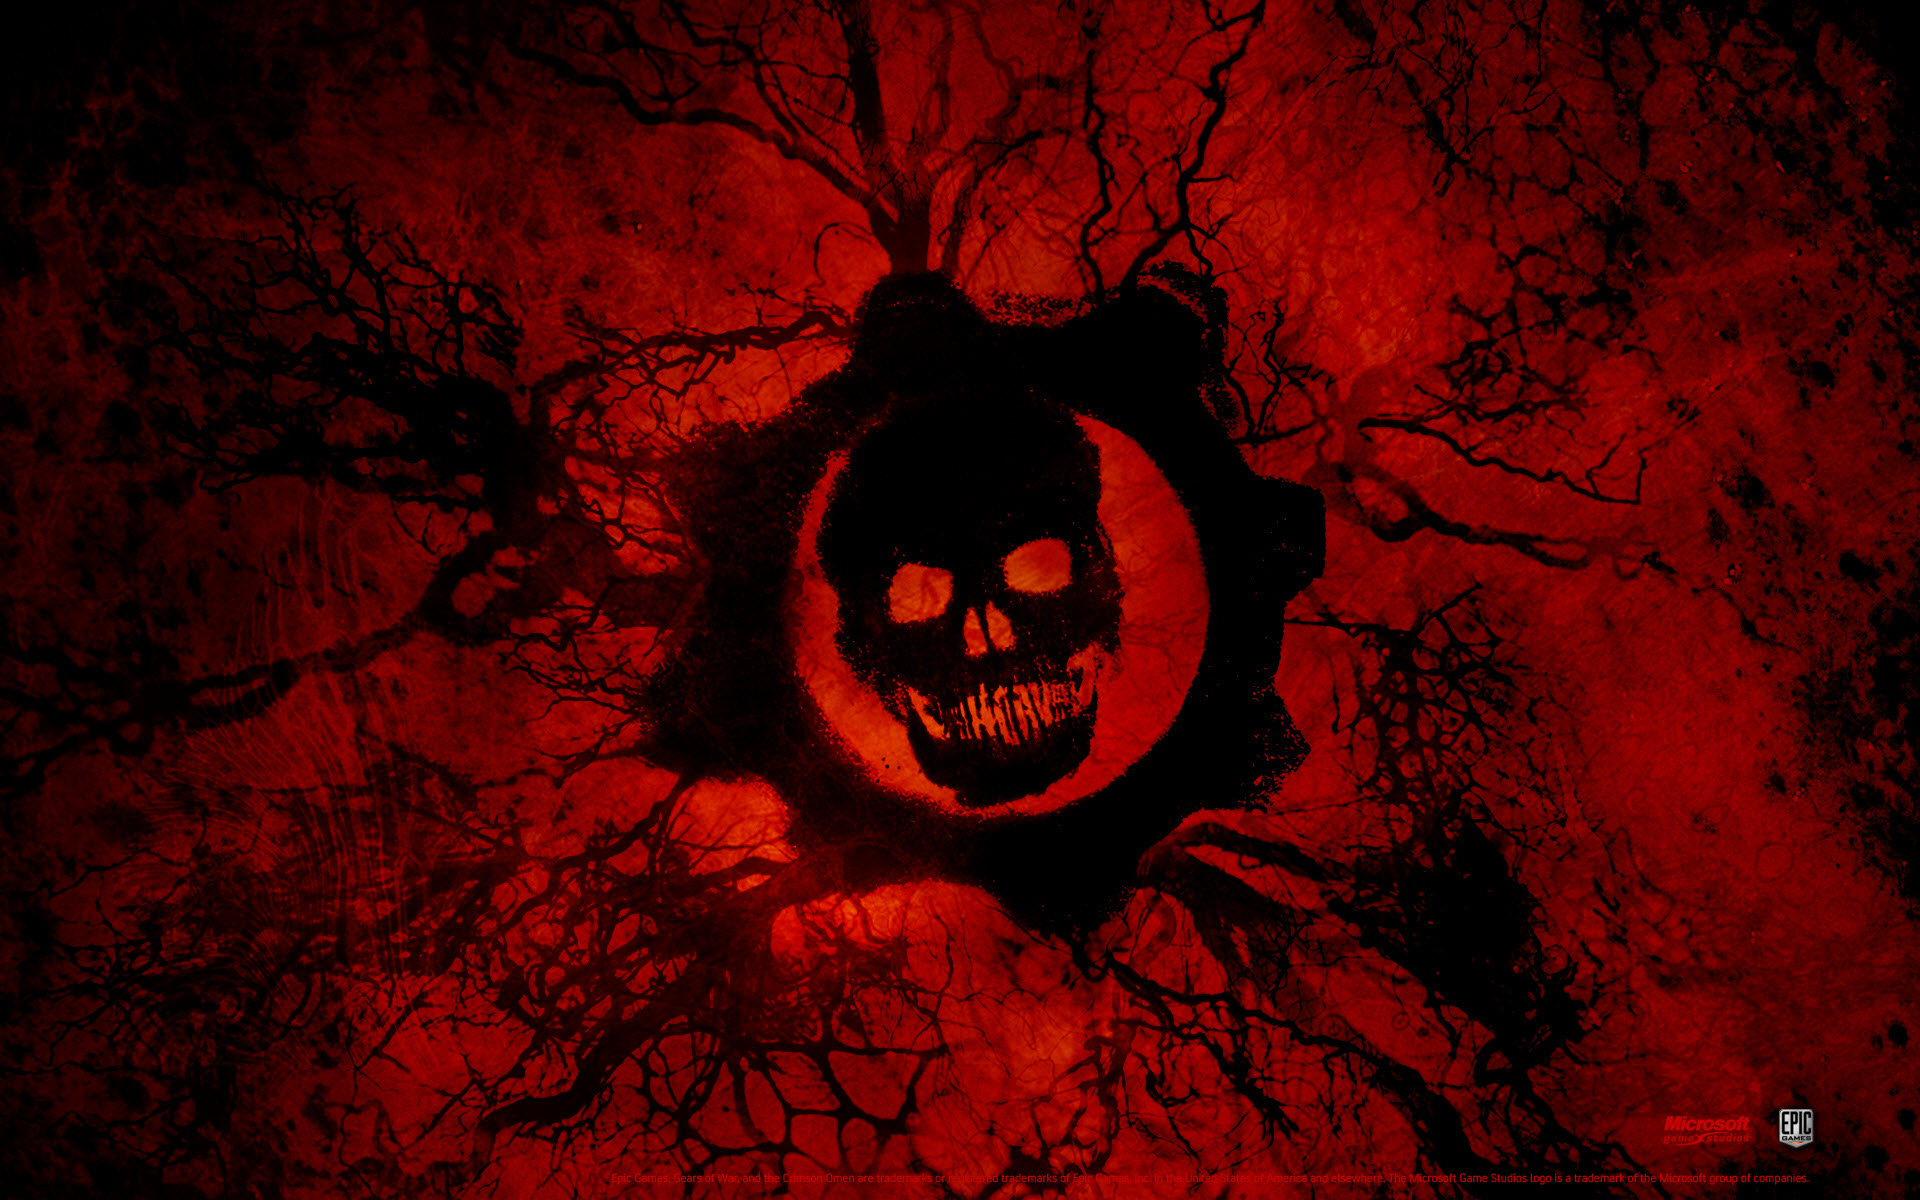 Resultado de imagem para gears of war